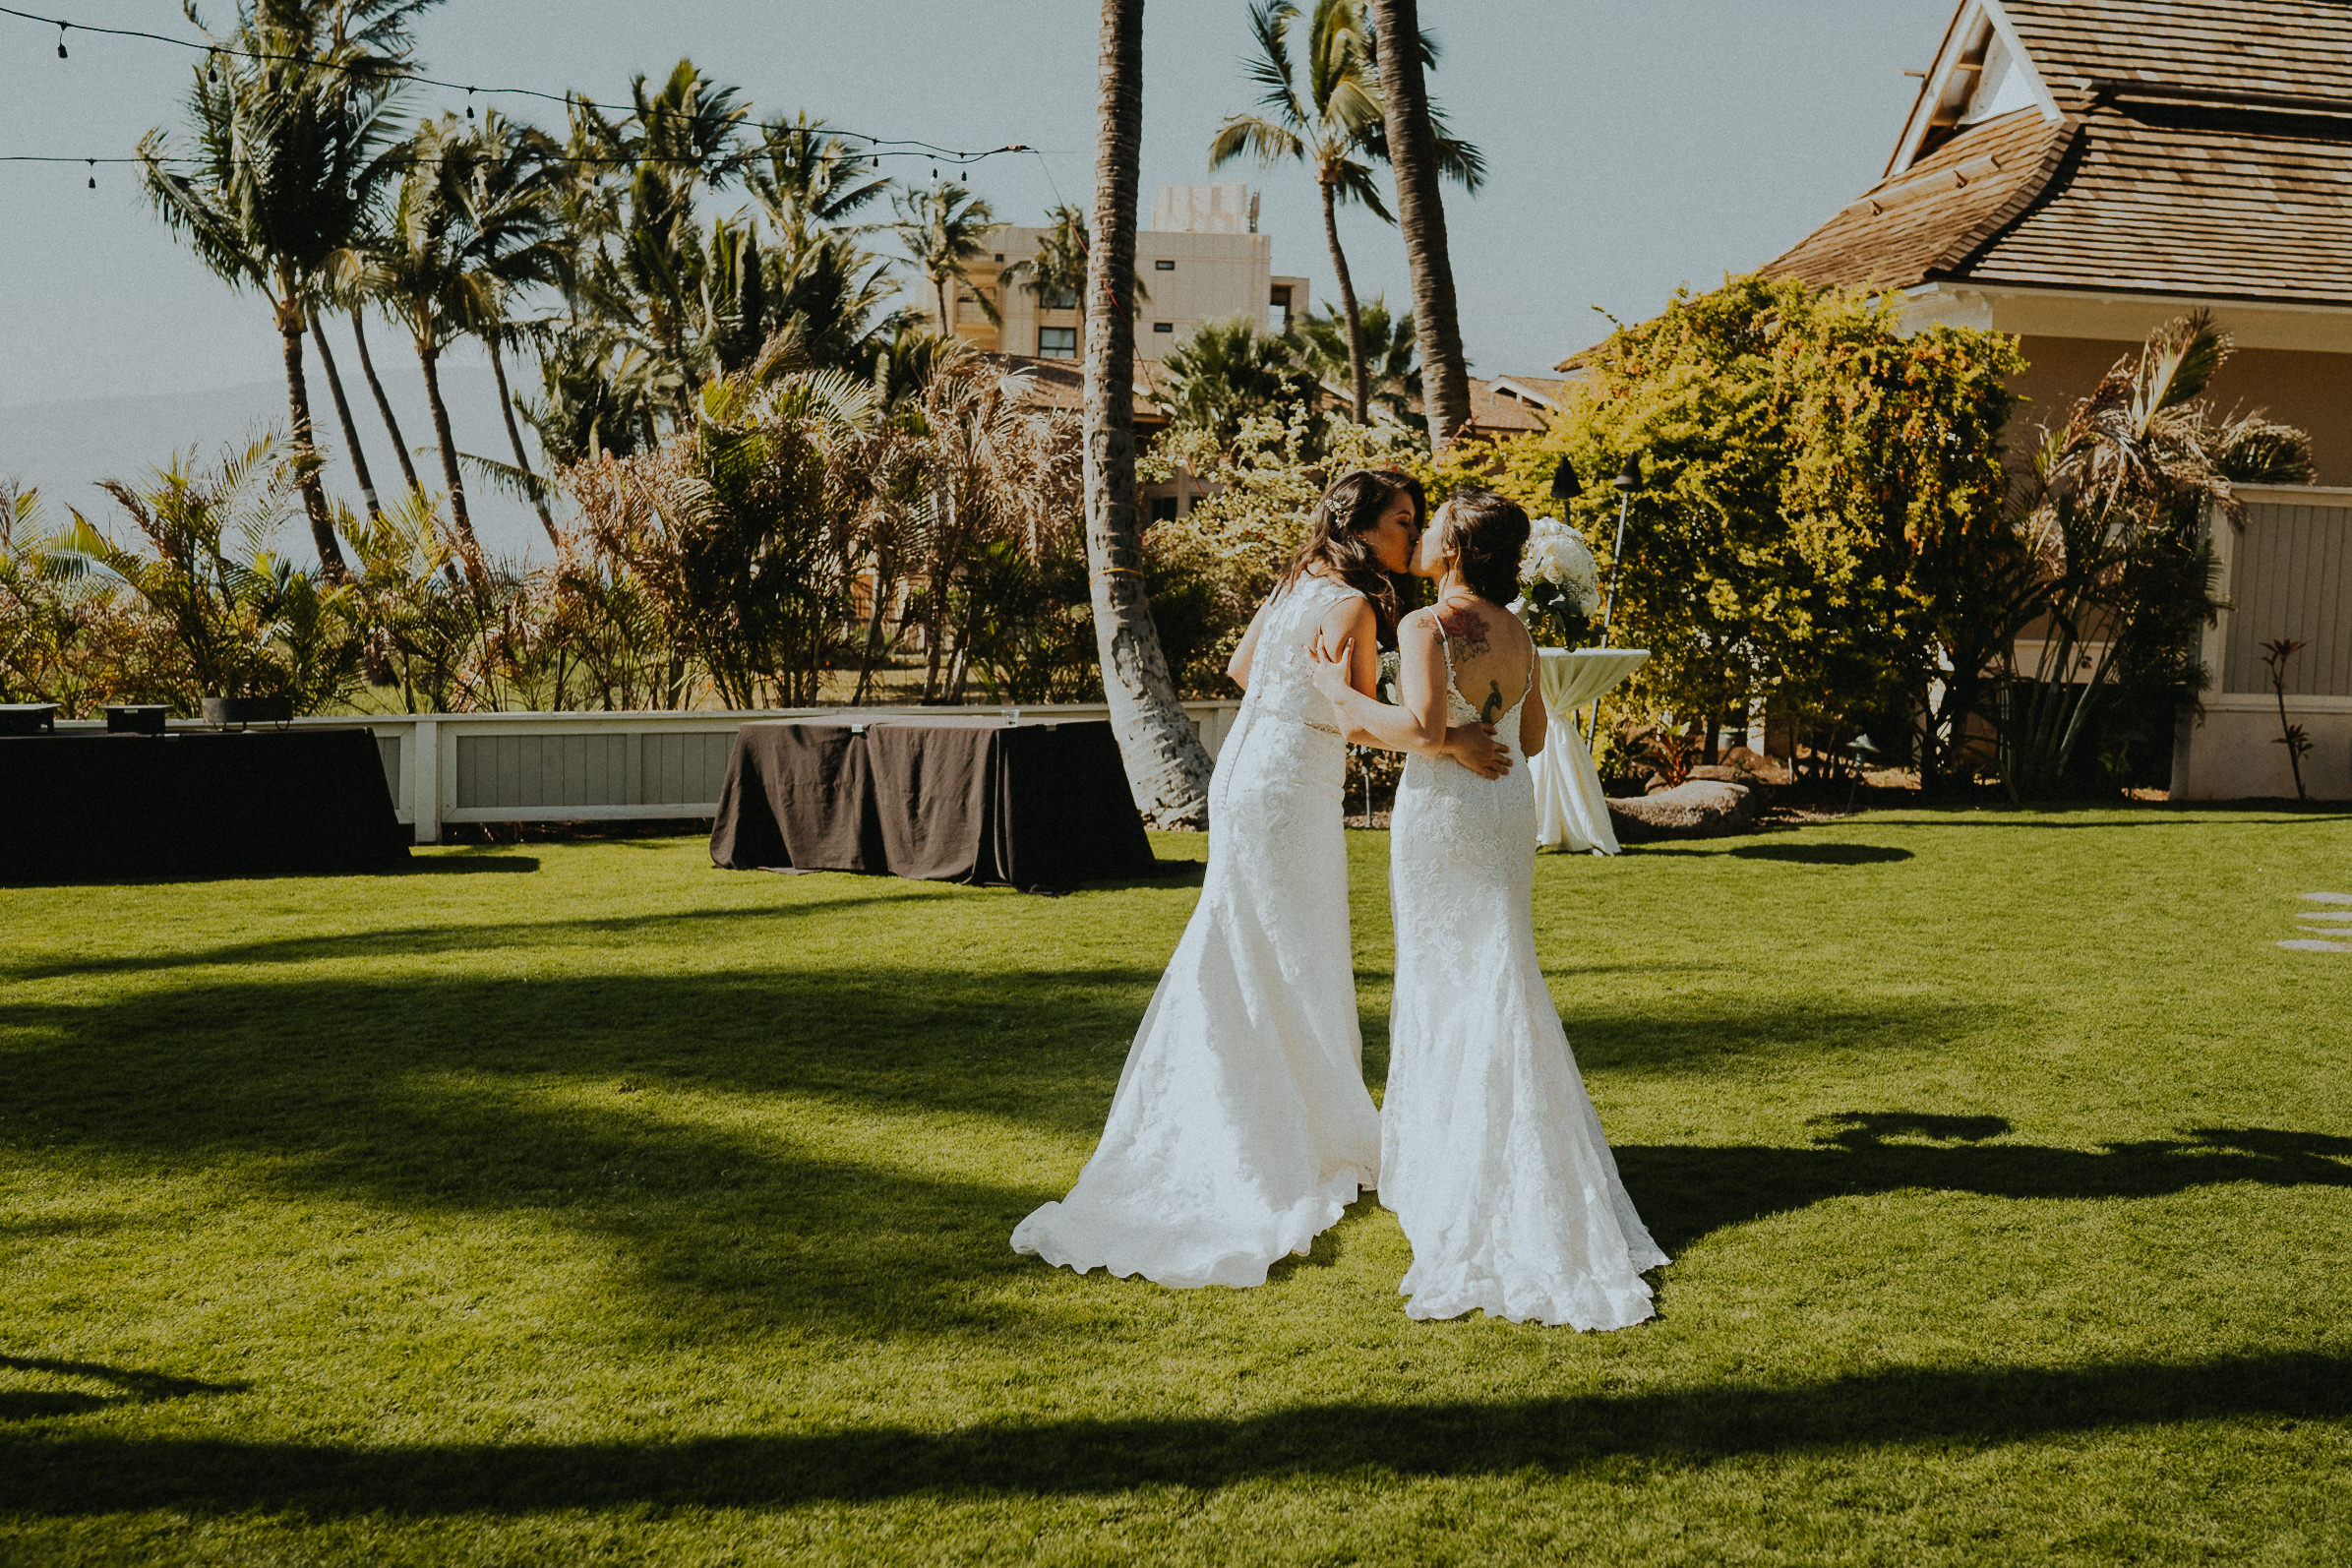 Maui_Destination_wedding_Alfred_Tang-27.jpg